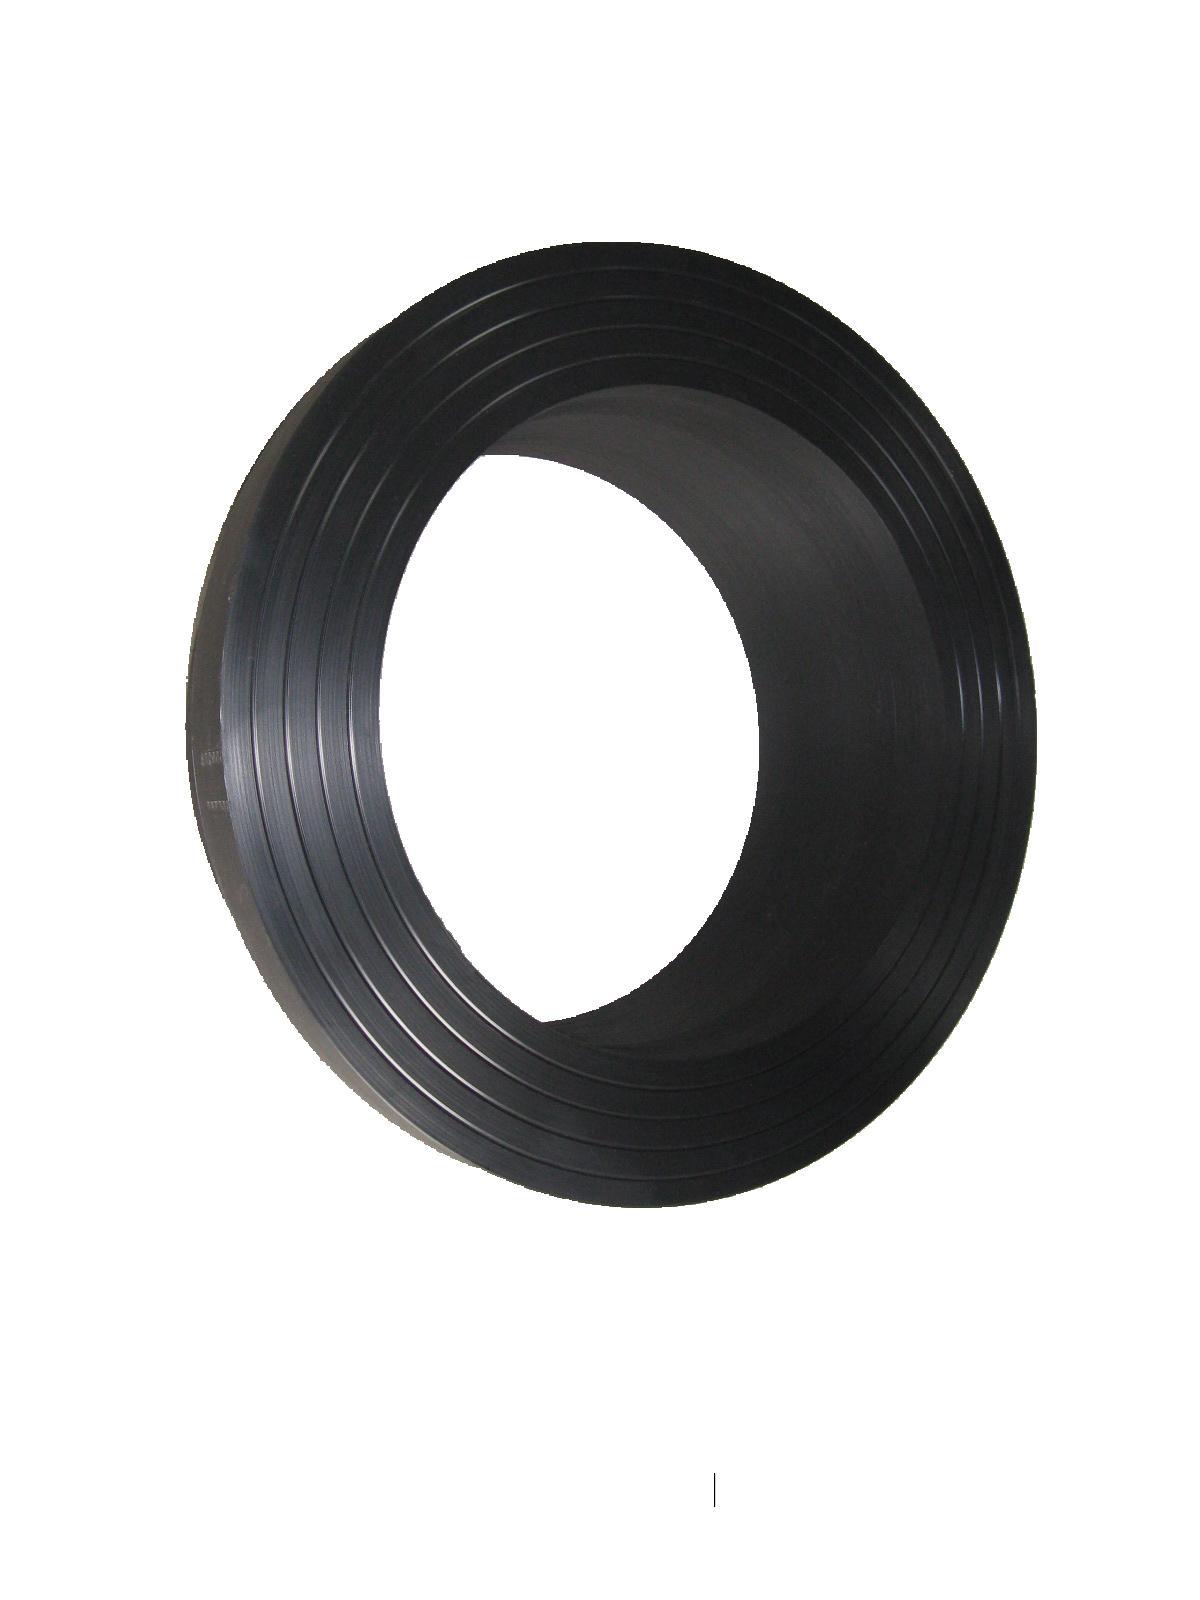 Customizable large diameter HDPE flange 1